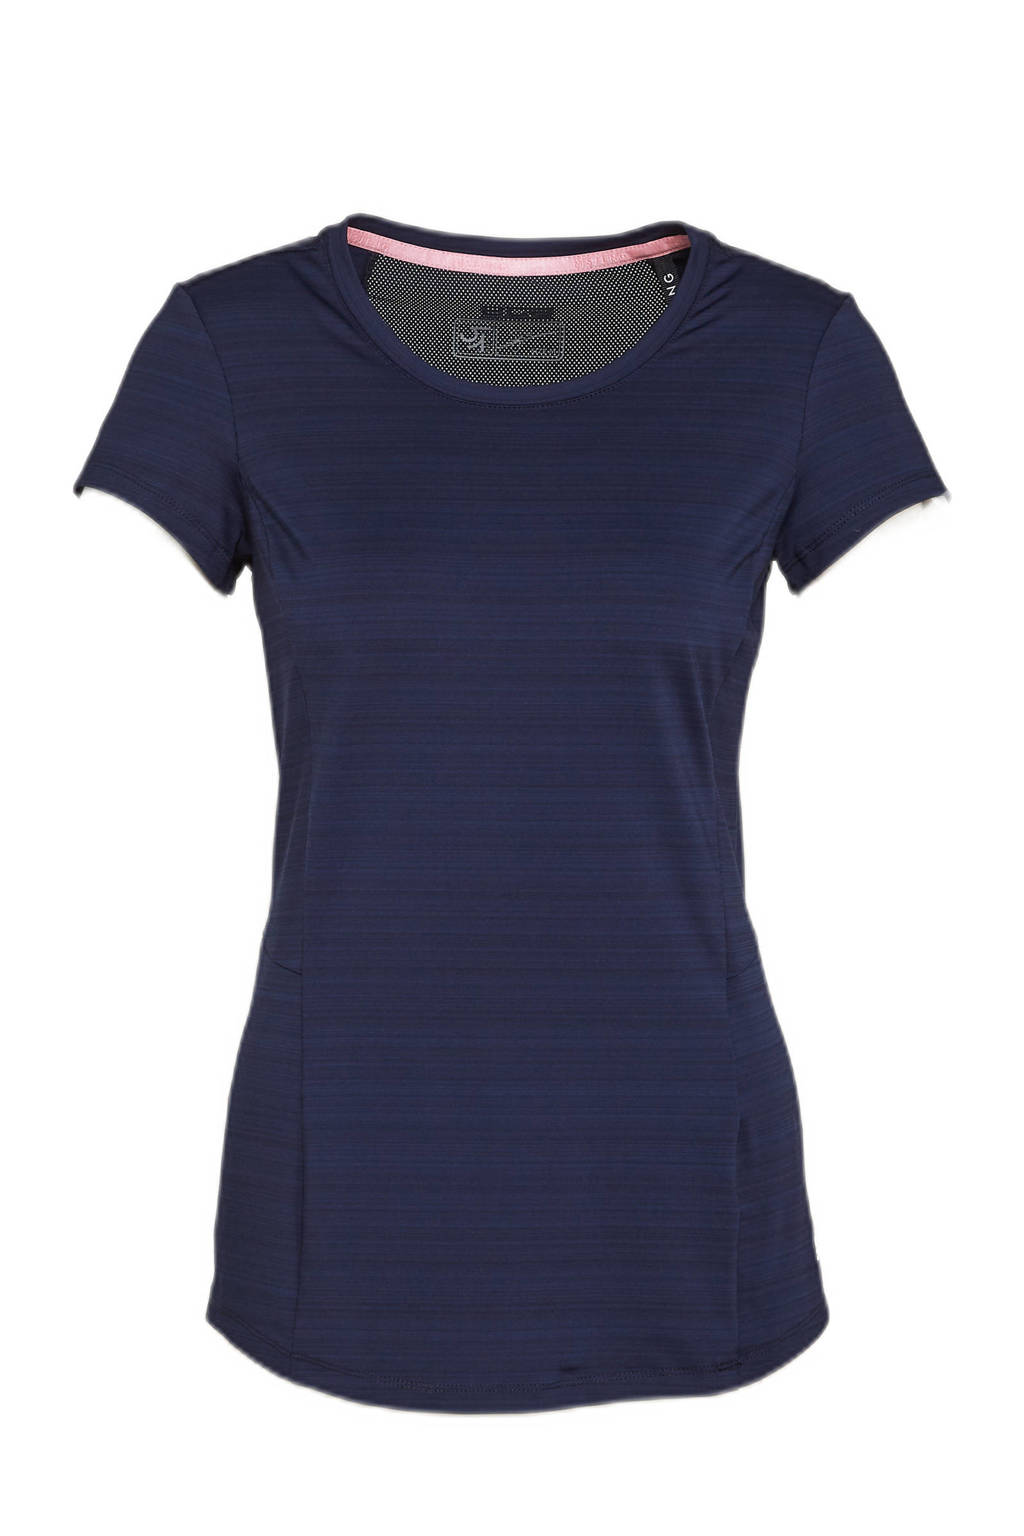 Sjeng Sports sport T-shirt Adelyn donkerblauw, Donkerblauw